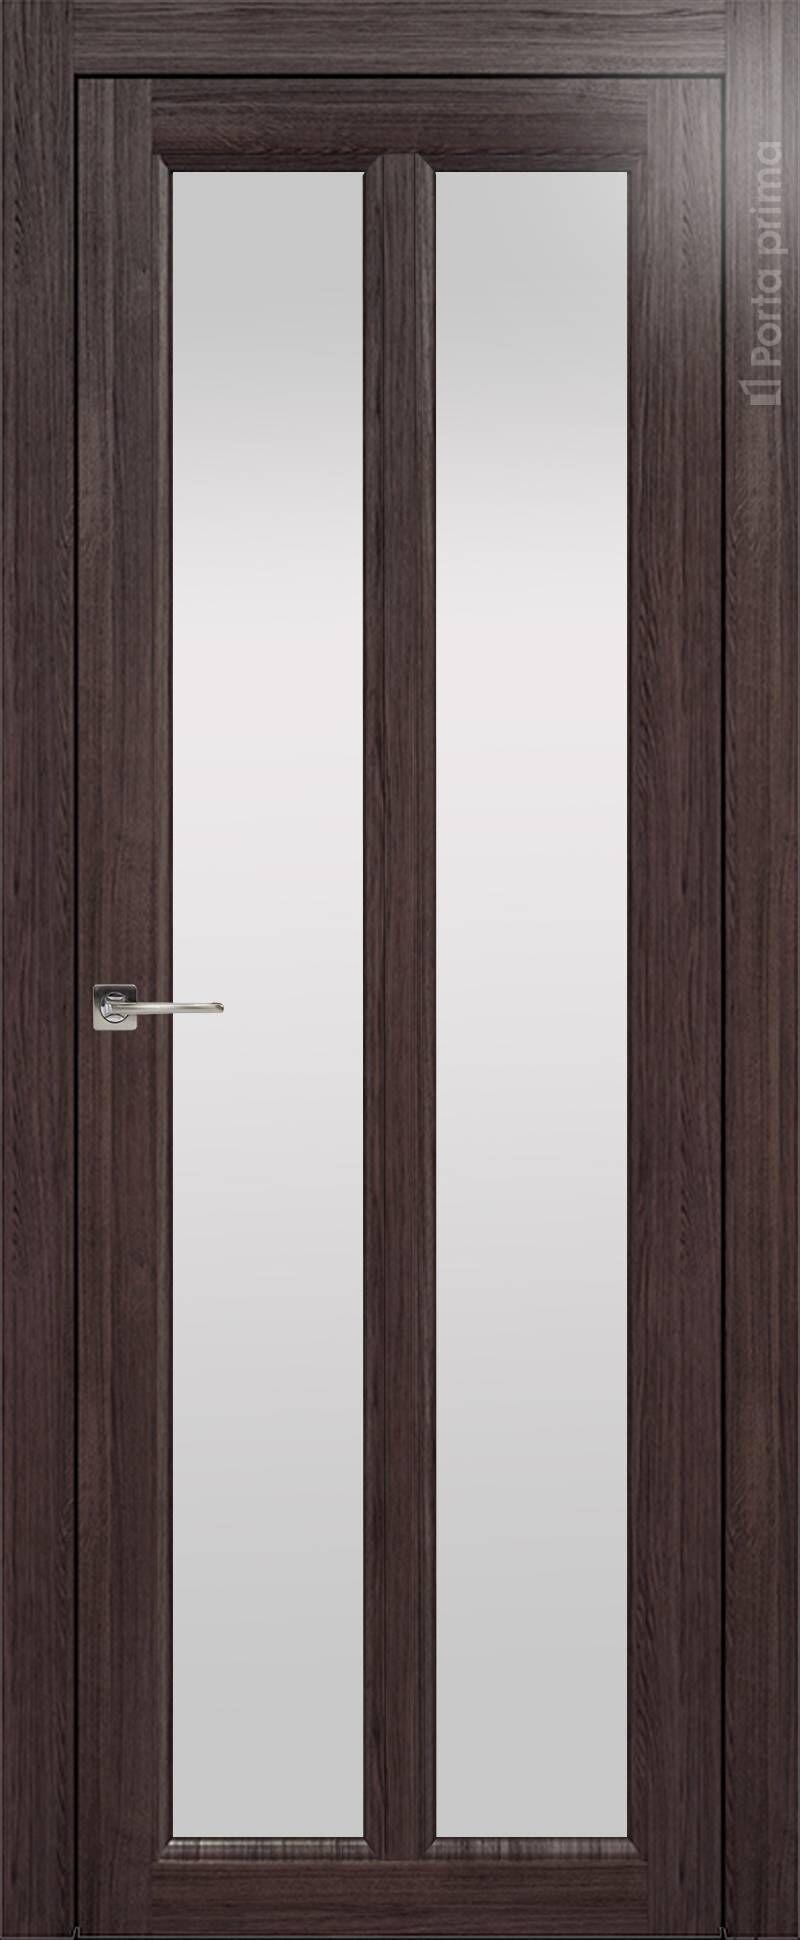 Sorrento-R Д4 цвет - Венге Нуар Со стеклом (ДО)